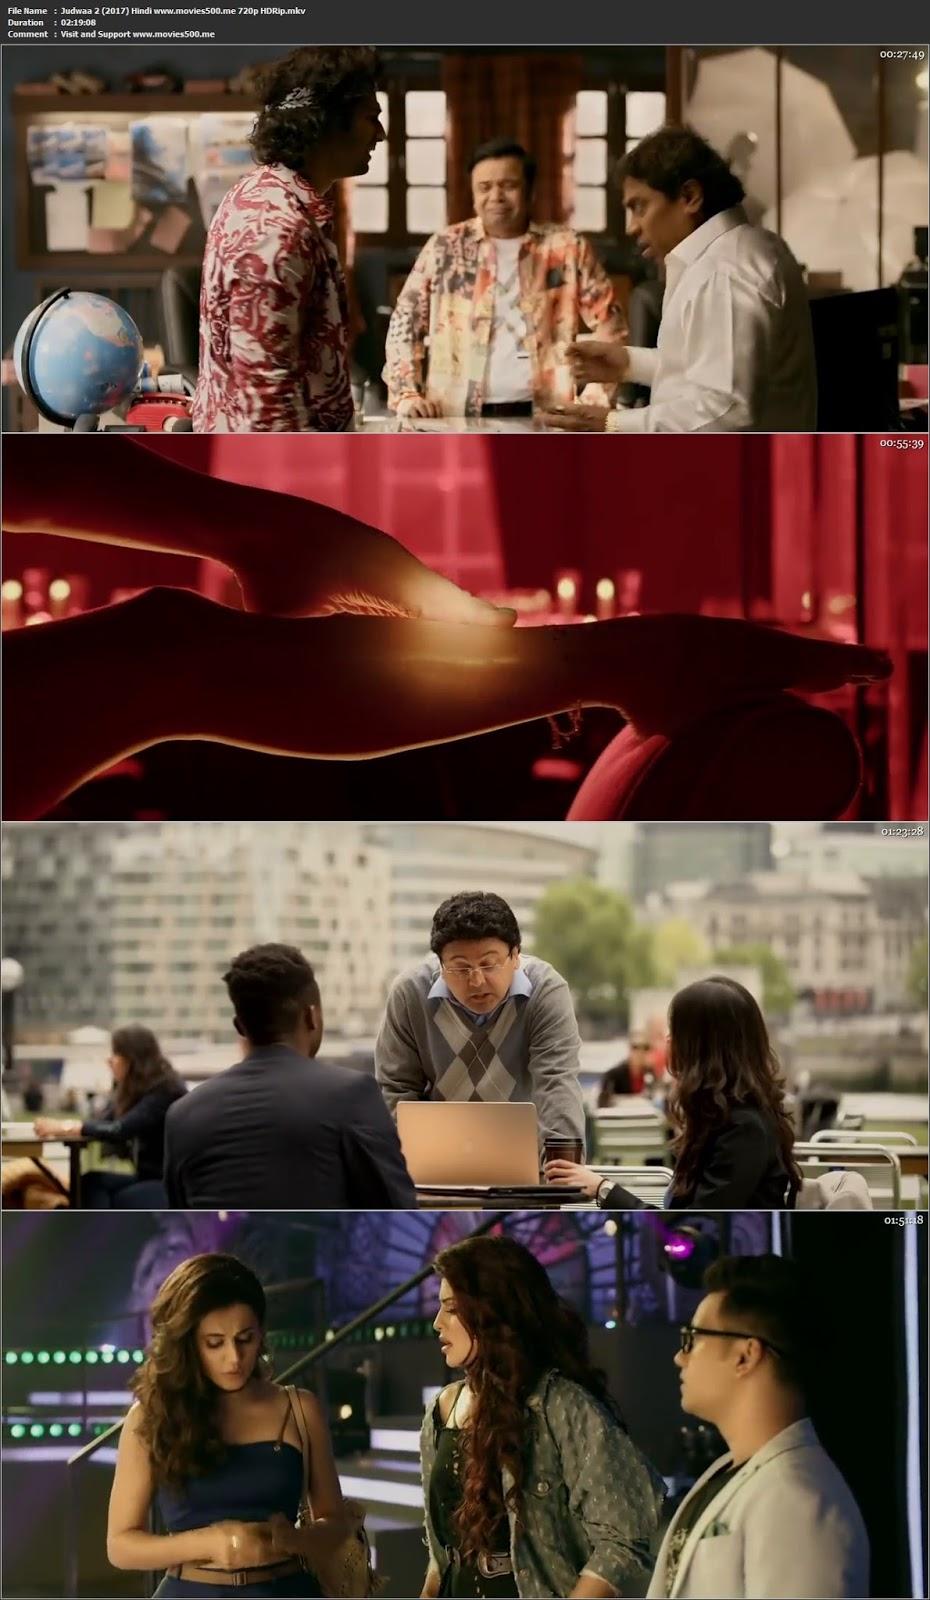 Judwaa 2 2017 Hindi Full Movie HDRip 720p 1GB at gileadhomecare.com